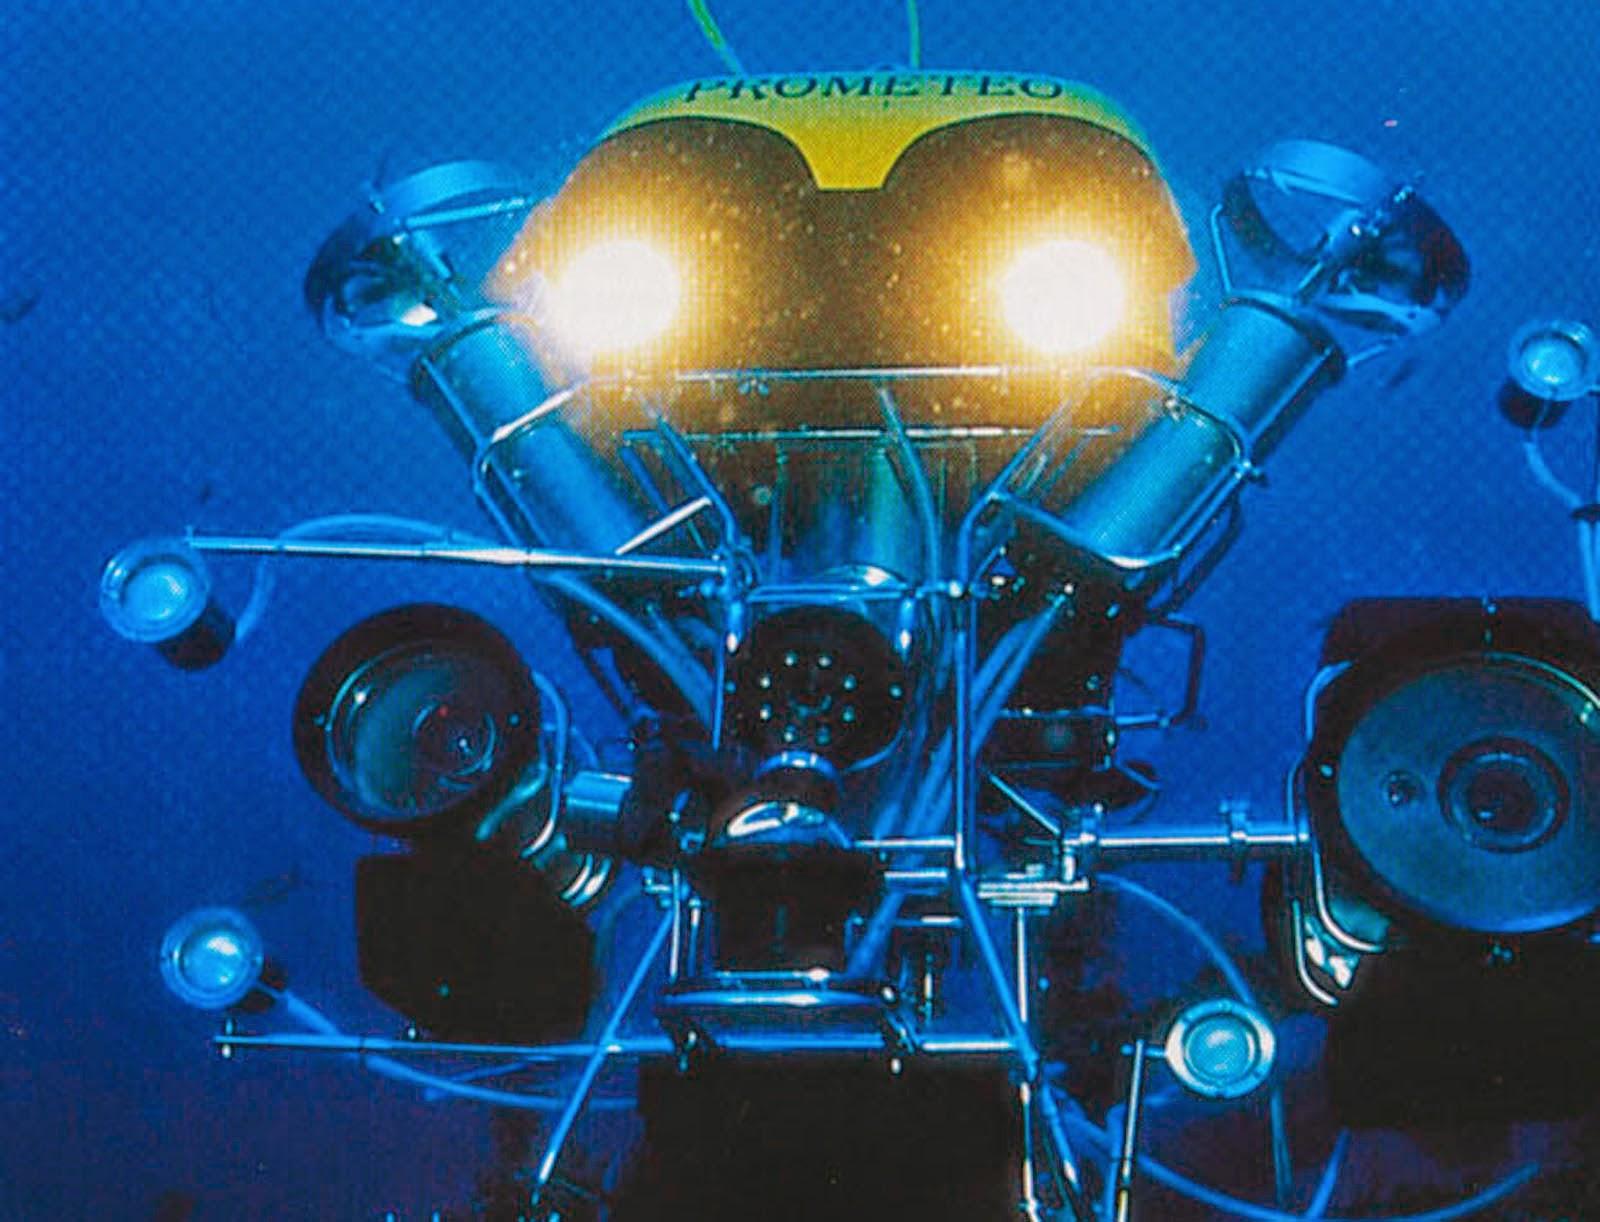 Tecnologia d'avanguardia per le ricerche marine